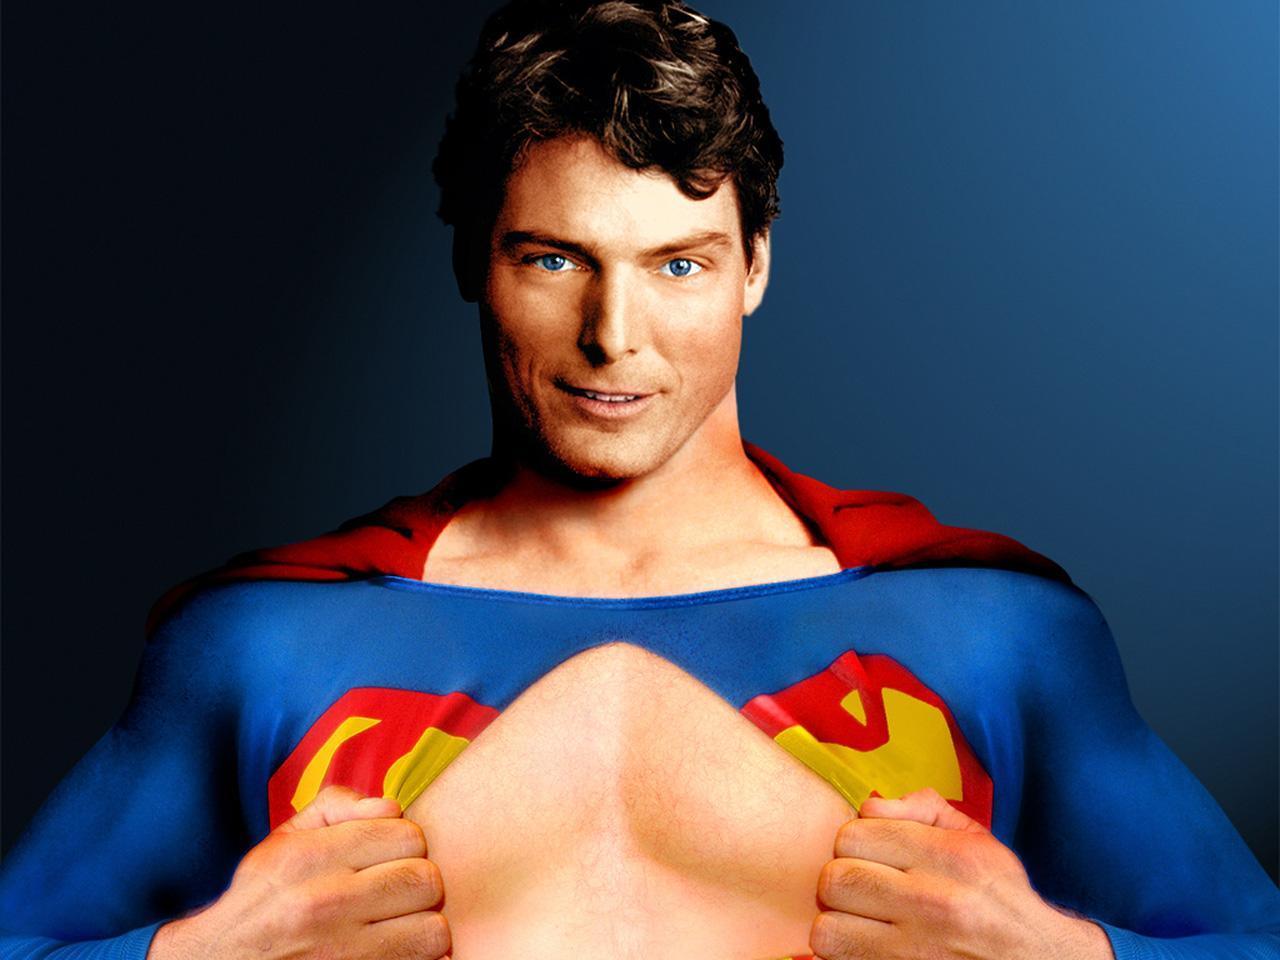 reeve como superman montagem de f wallpaper sobre christopher reeve 1280x960